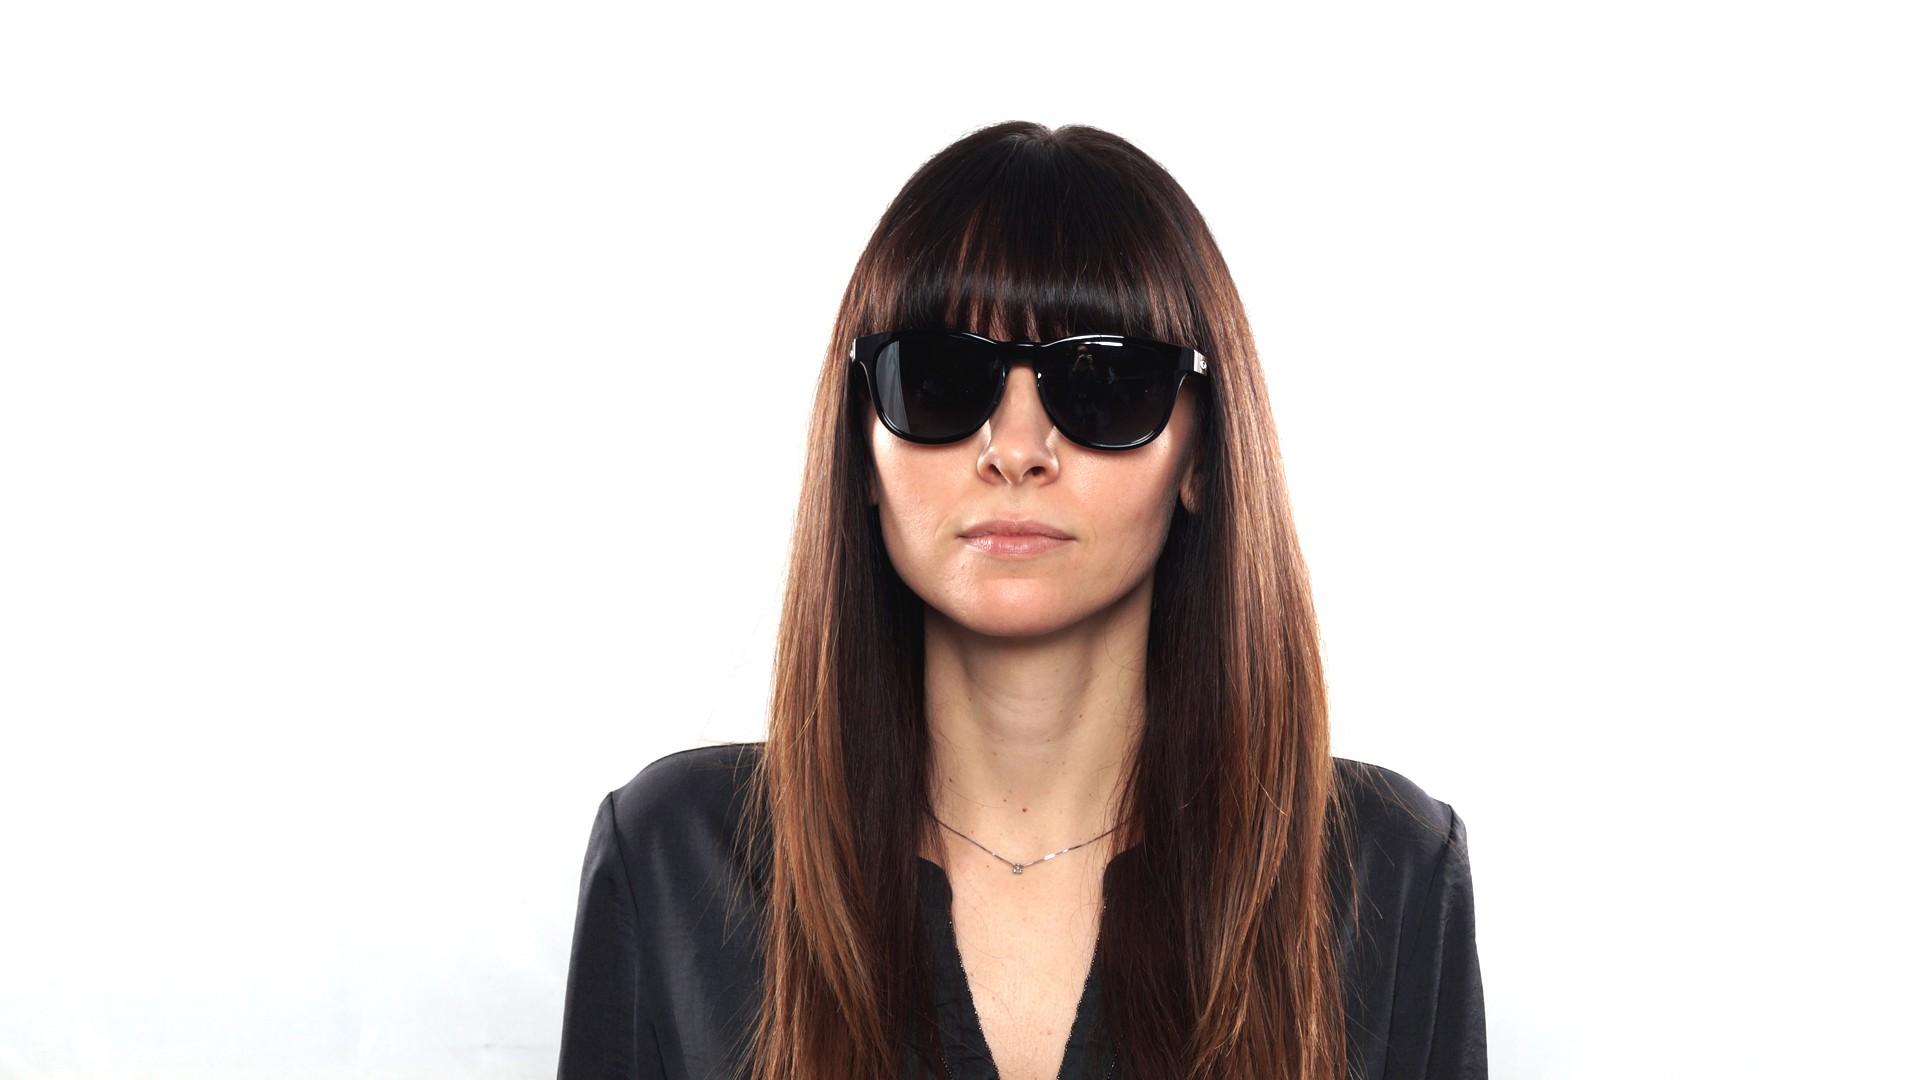 b4c70c3f02 Sunglasses Oakley Stringer Polished black Black OO9315 03 55-16 Medium  Mirror